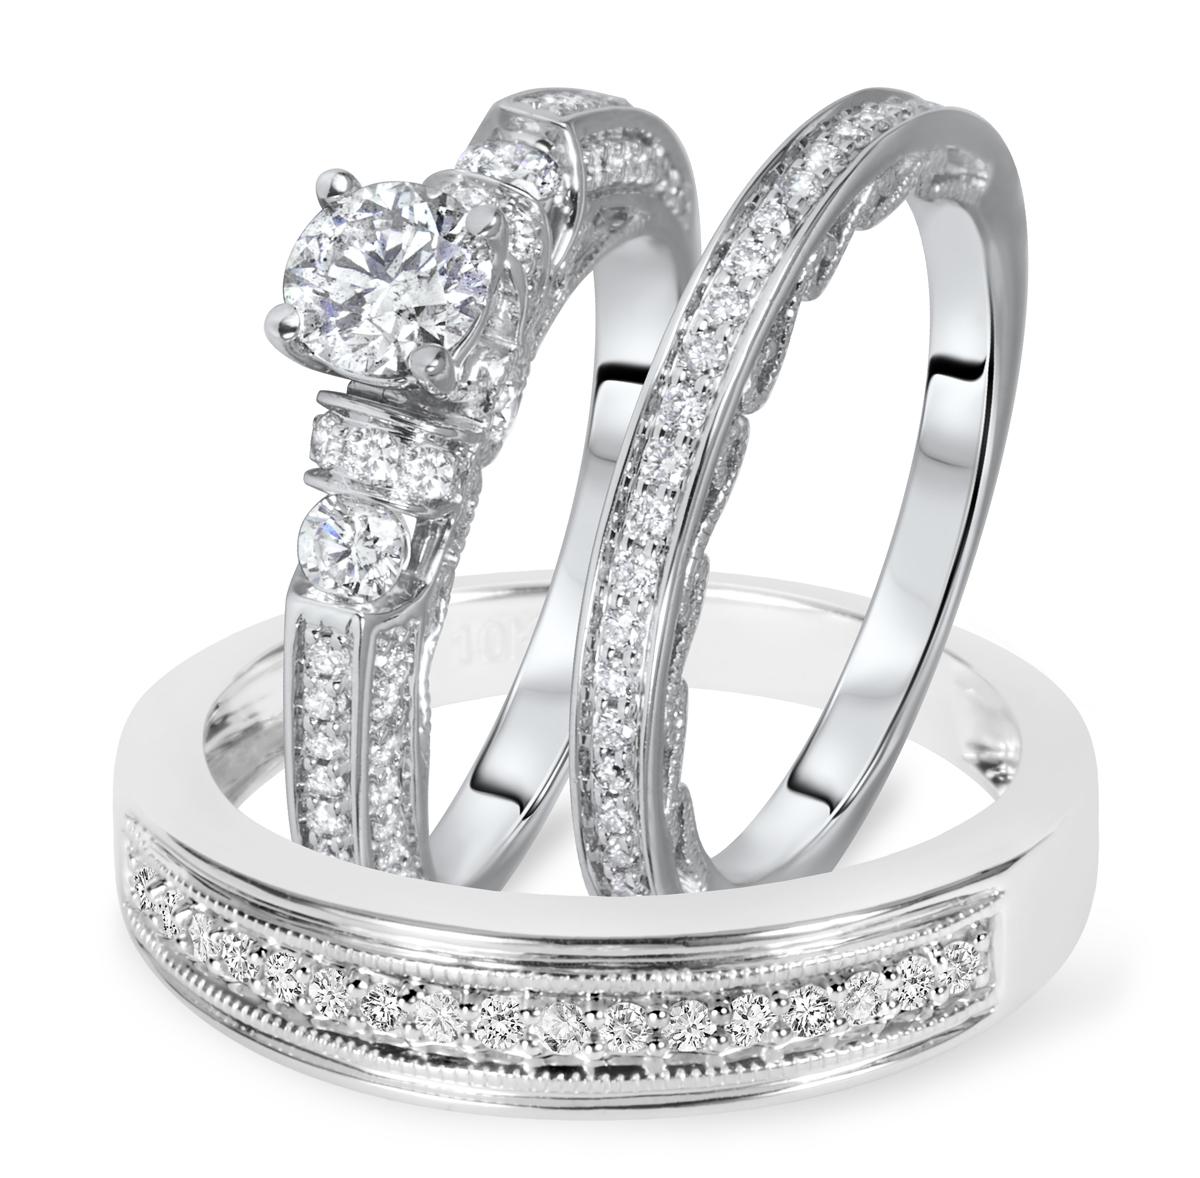 1 1/2 Carat T.W. Round Cut Diamond Women's Engagement Ring, Ladies Wedding Band,